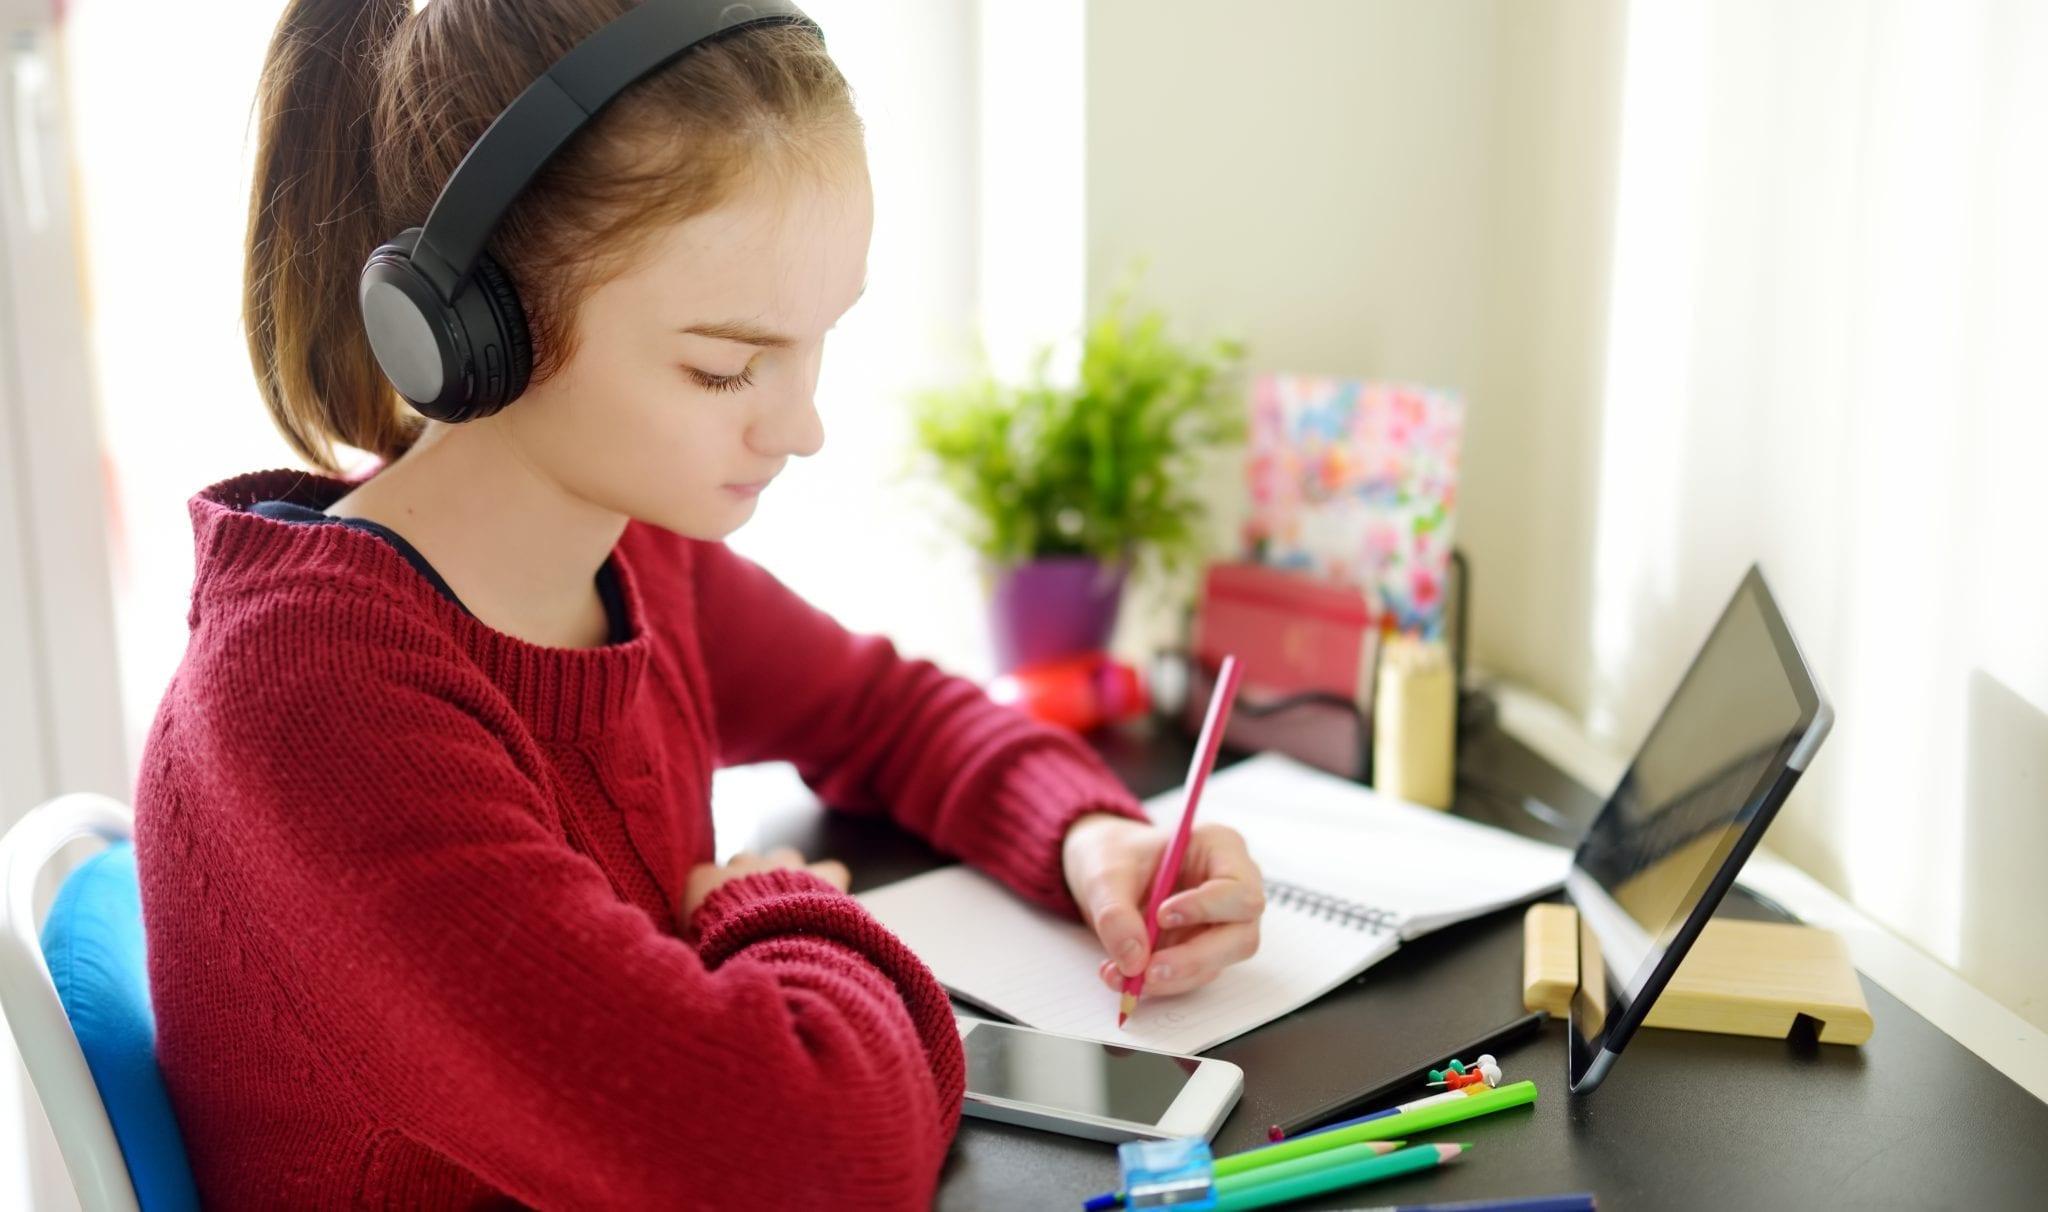 Preteen girl working on homework using tablet